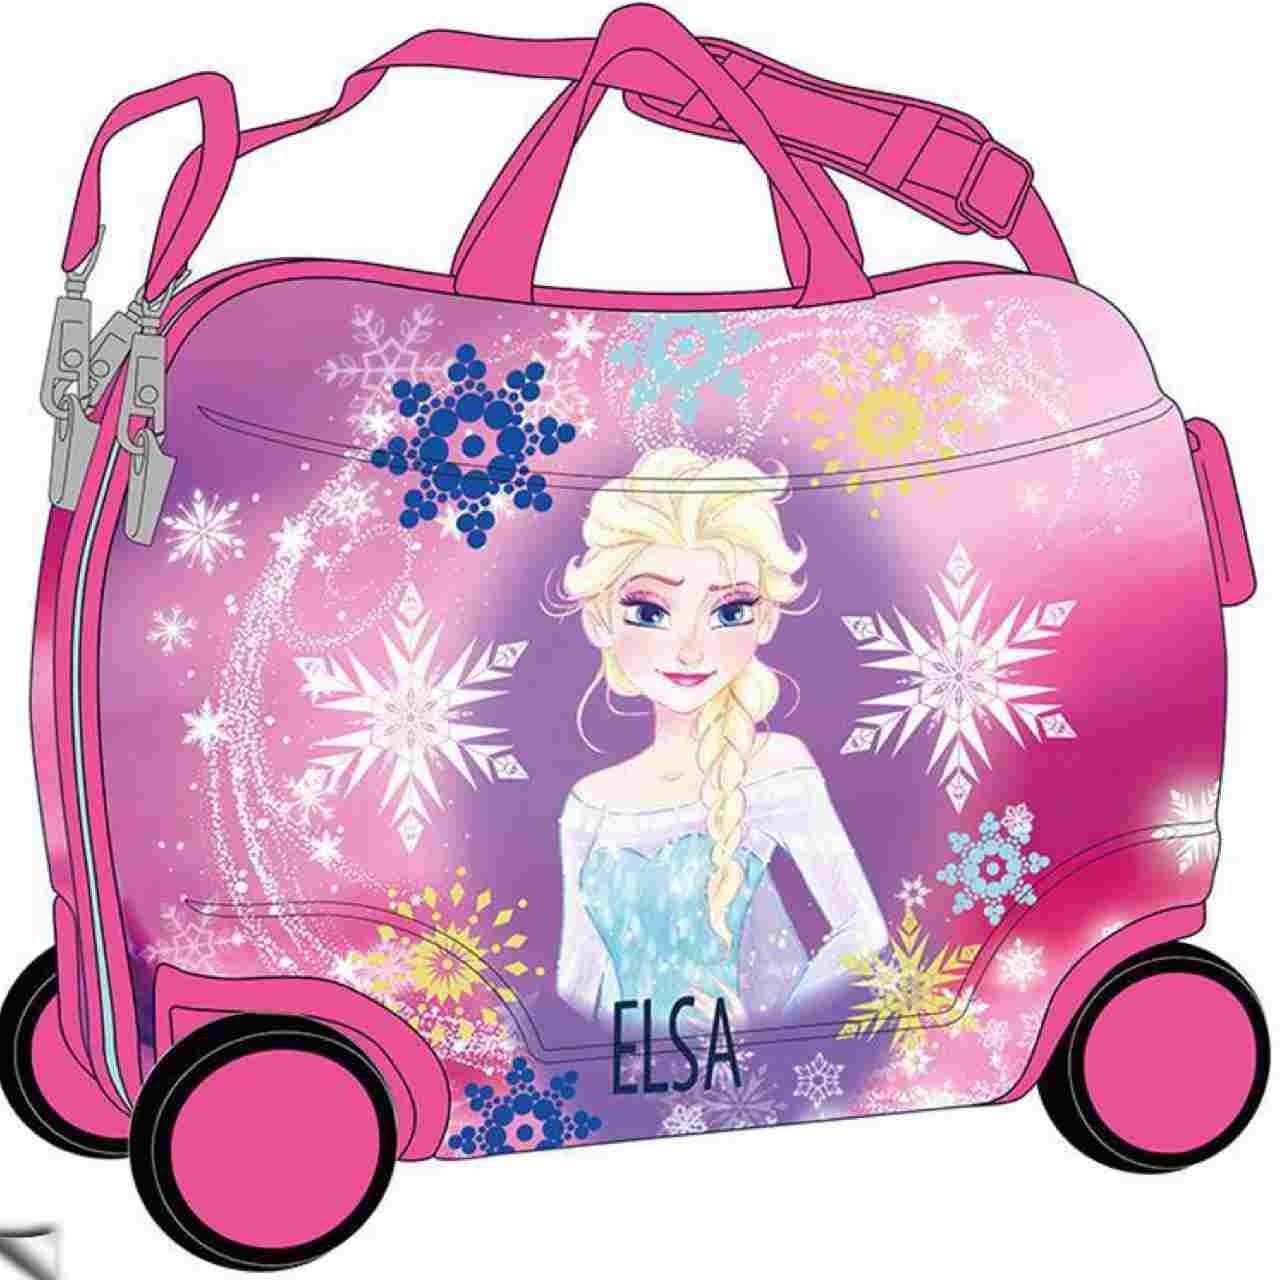 Frozen Elsa Kindergepäck, 50 cm, 34 liters, Rosa